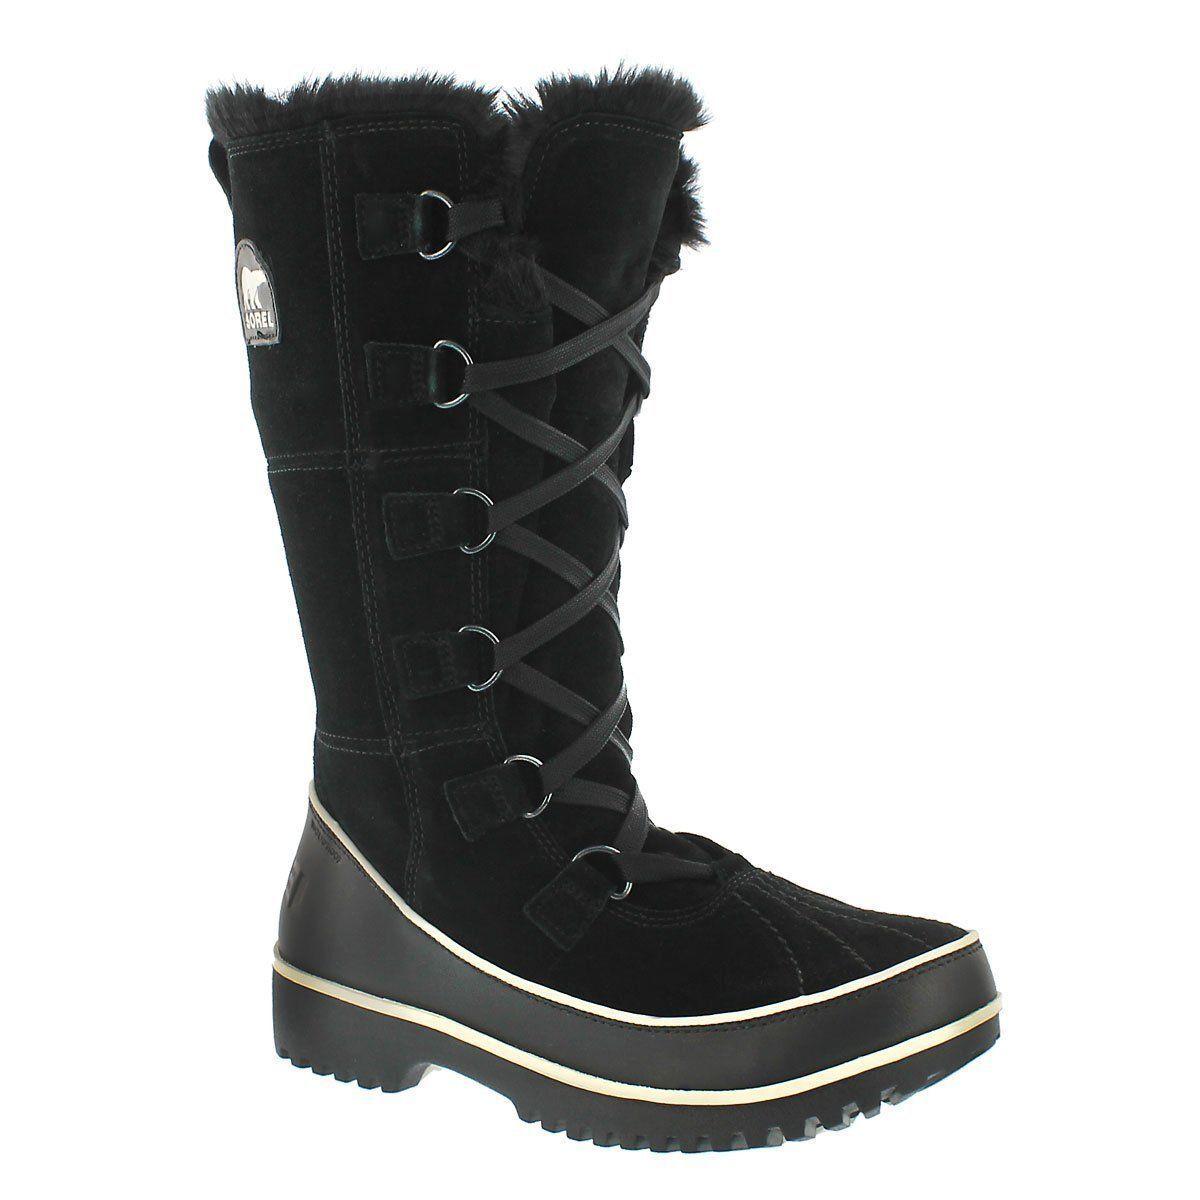 SOREL UP Damenschuhe Waterproof Tivoli High II LACE UP SOREL WINTER Stiefel,BLACK SIZE 6 ff0b87